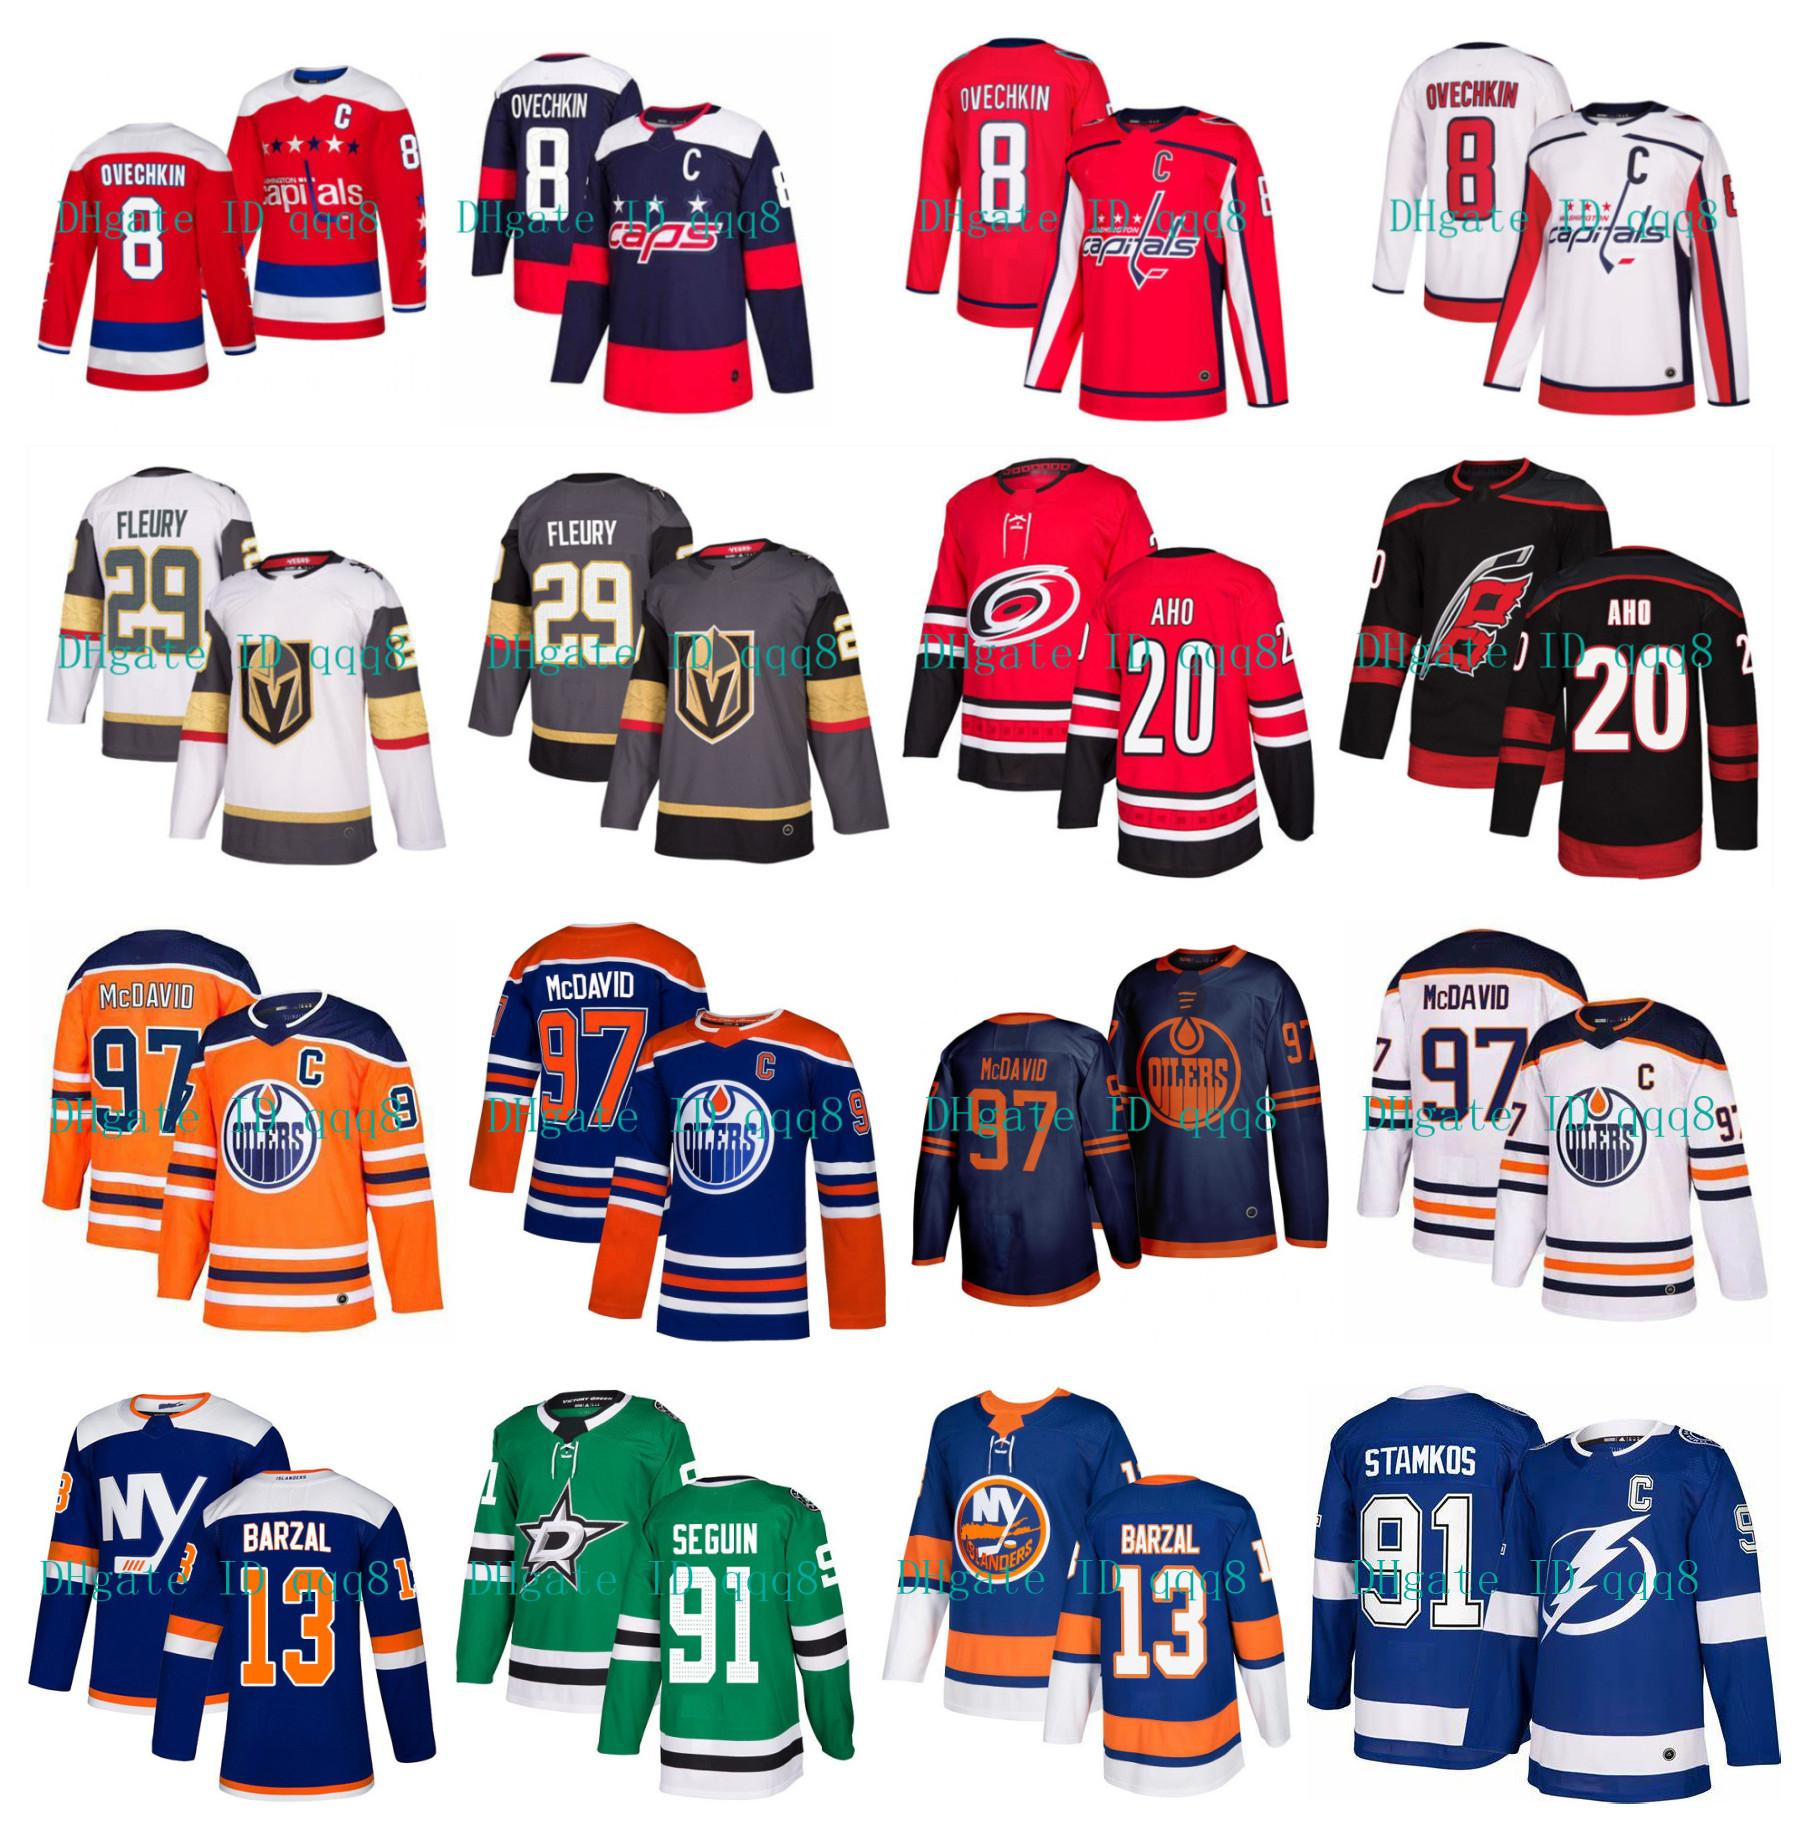 Connor McDavid Edmonton Oilers d'Alex Ovechkin des Capitals de Washington Marc-André Fleury Stamkos Mathew Barzal Hurricanes Aho NHL Hockey